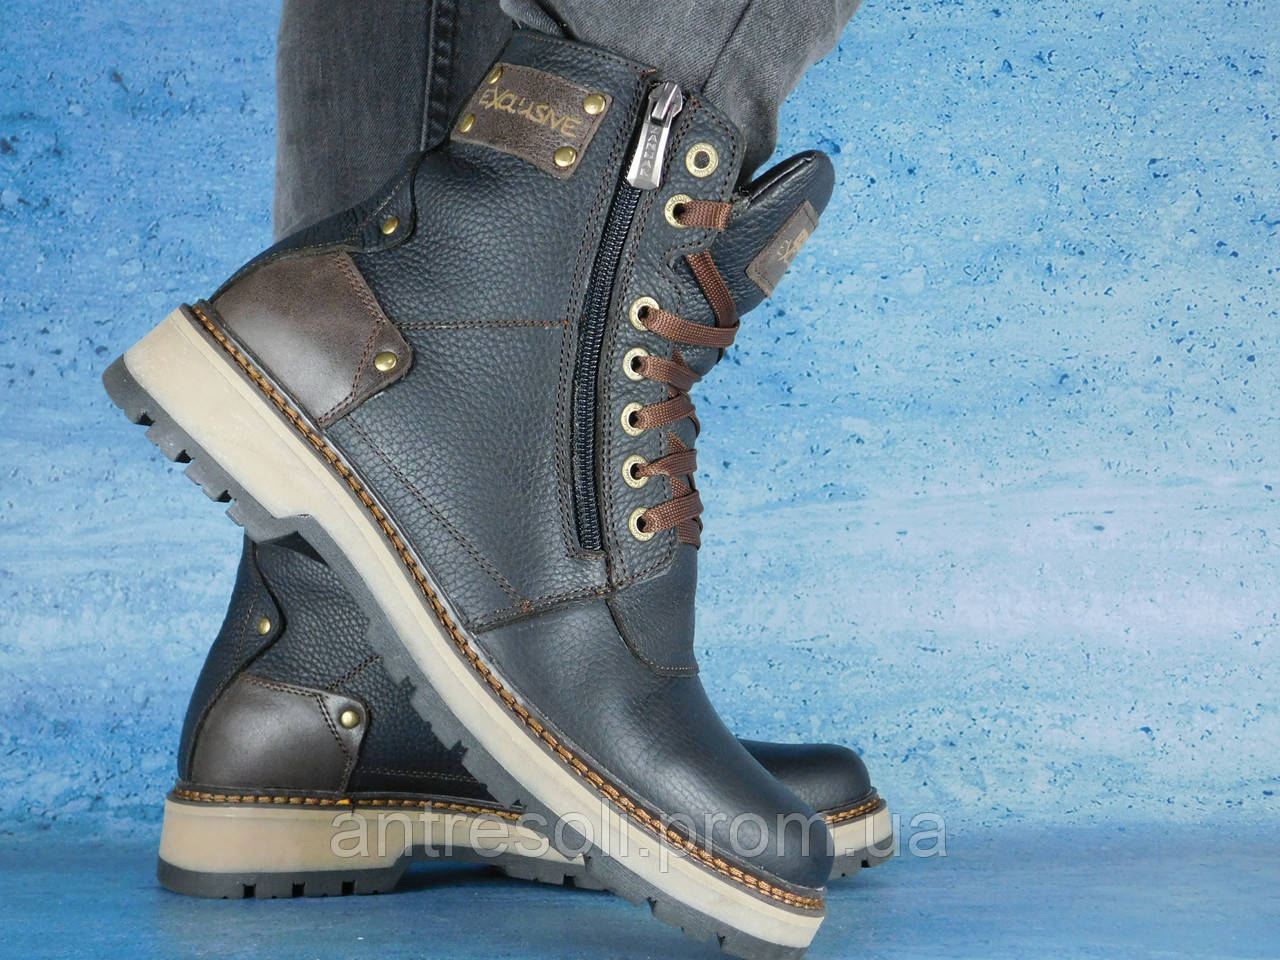 Мужские зимние ботинки Zangak Exclusive Черный 10543  1 150 грн ... 9a3e56b400184